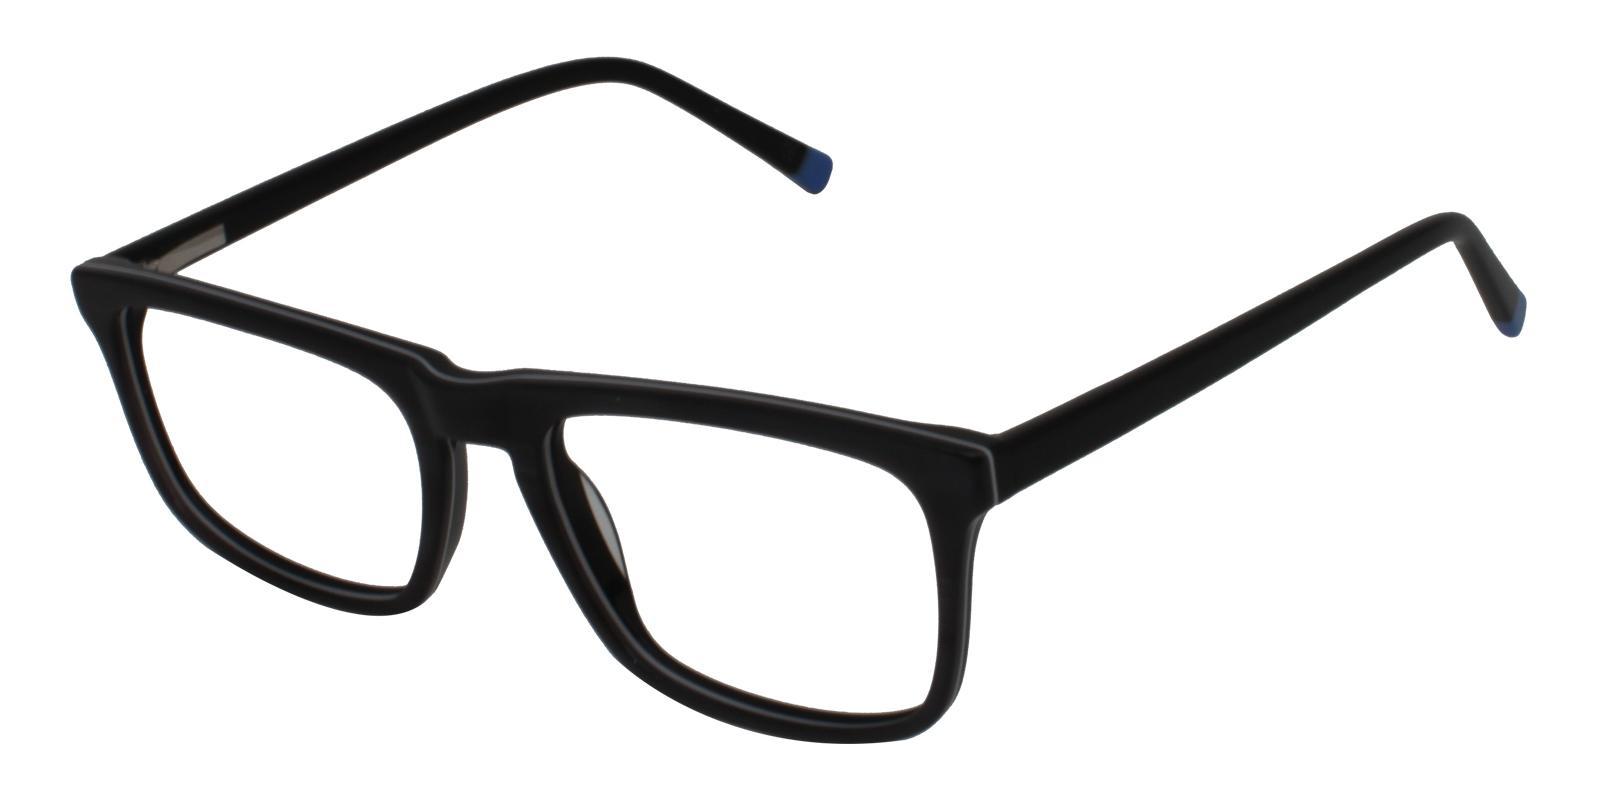 McIntosh Striped Acetate Eyeglasses , Lightweight , SpringHinges , UniversalBridgeFit Frames from ABBE Glasses